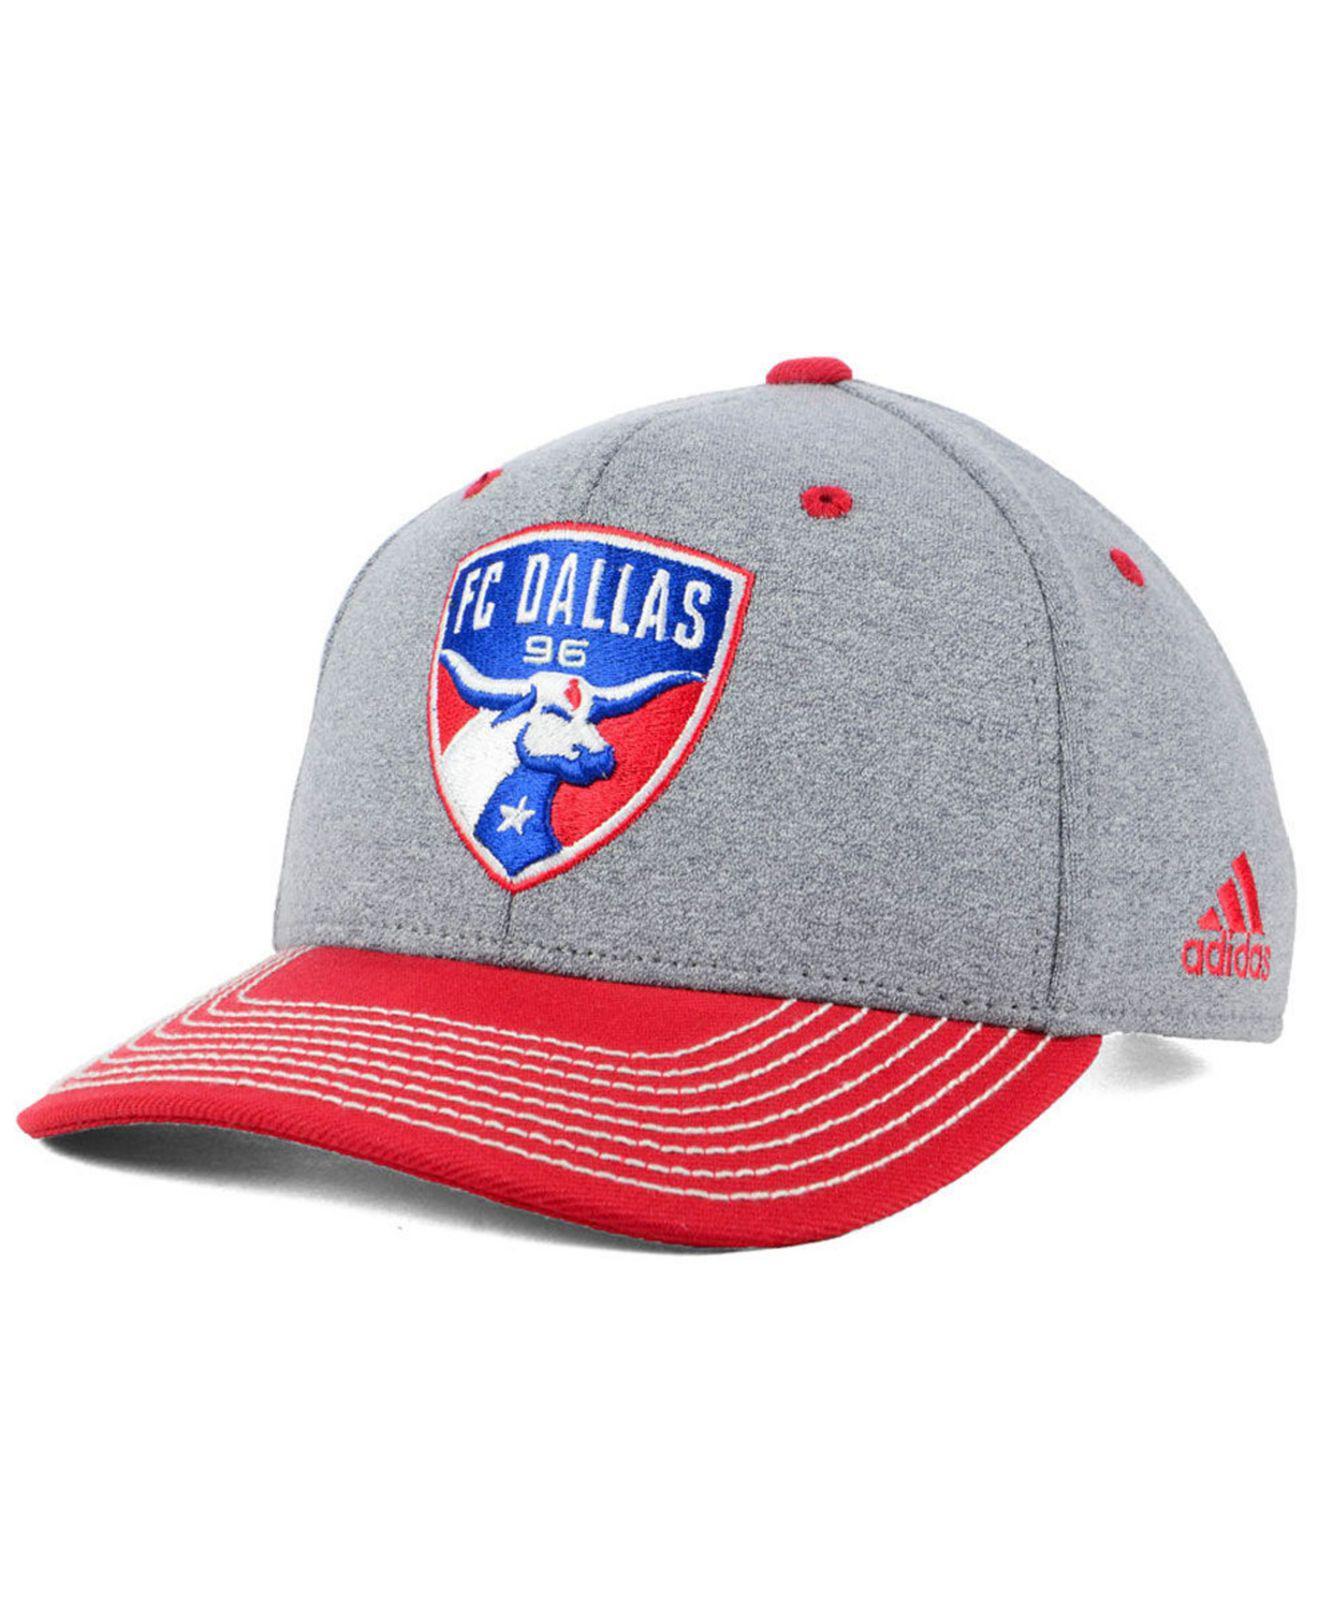 online retailer b7d7c b0815 Lyst - adidas Fc Dallas Structure Adjustable Cap in Red for Men